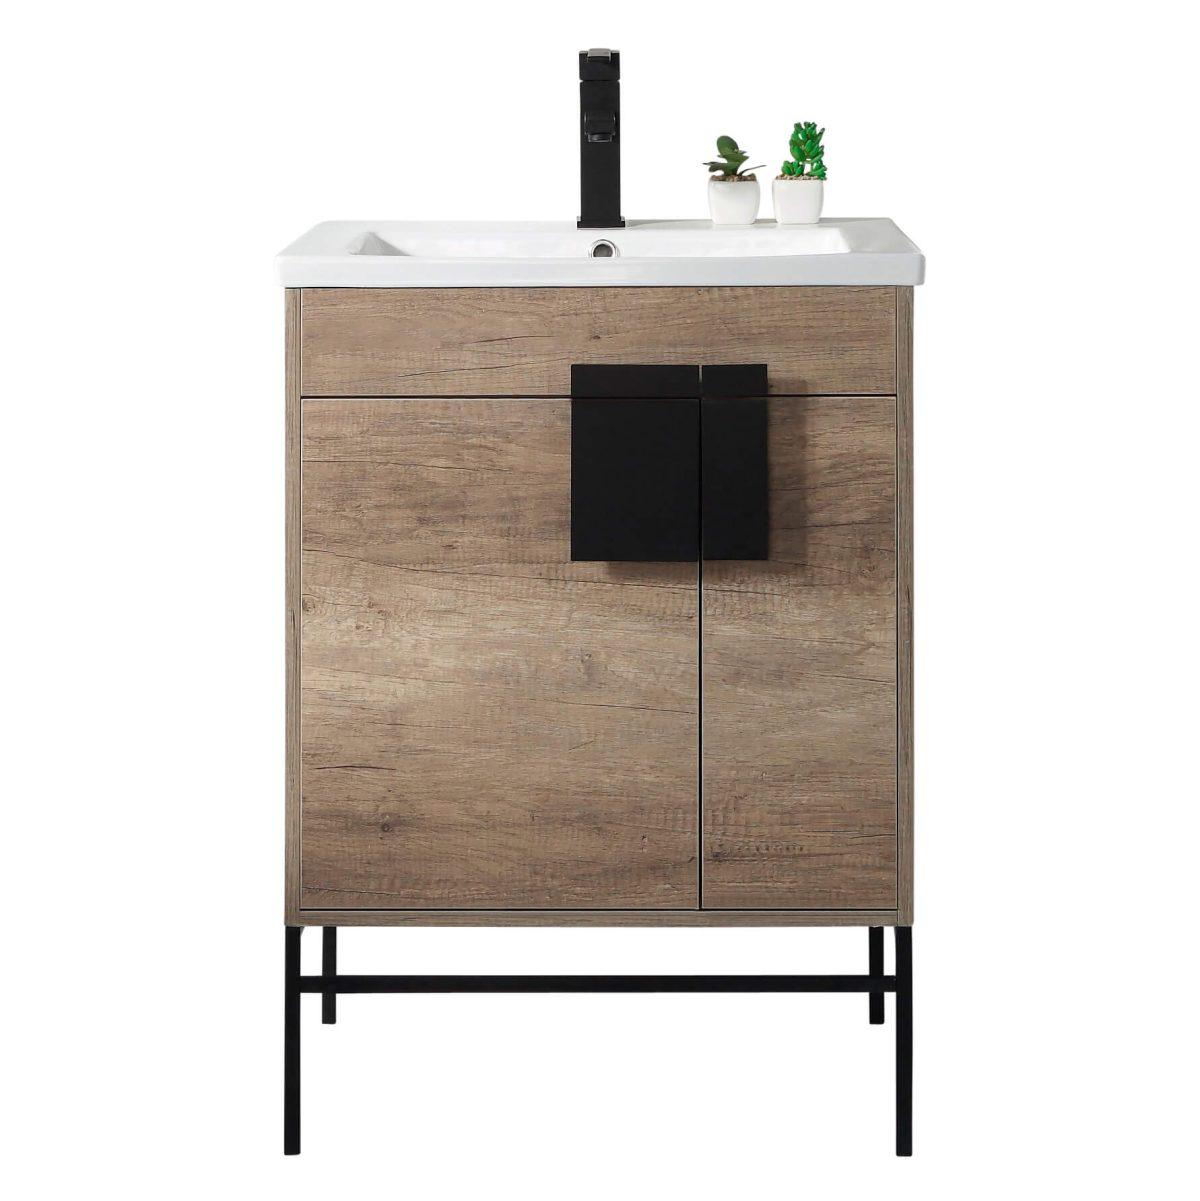 "Shawbridge 24"" Modern Bathroom Vanity  Shadow Gray with Black Hardware"